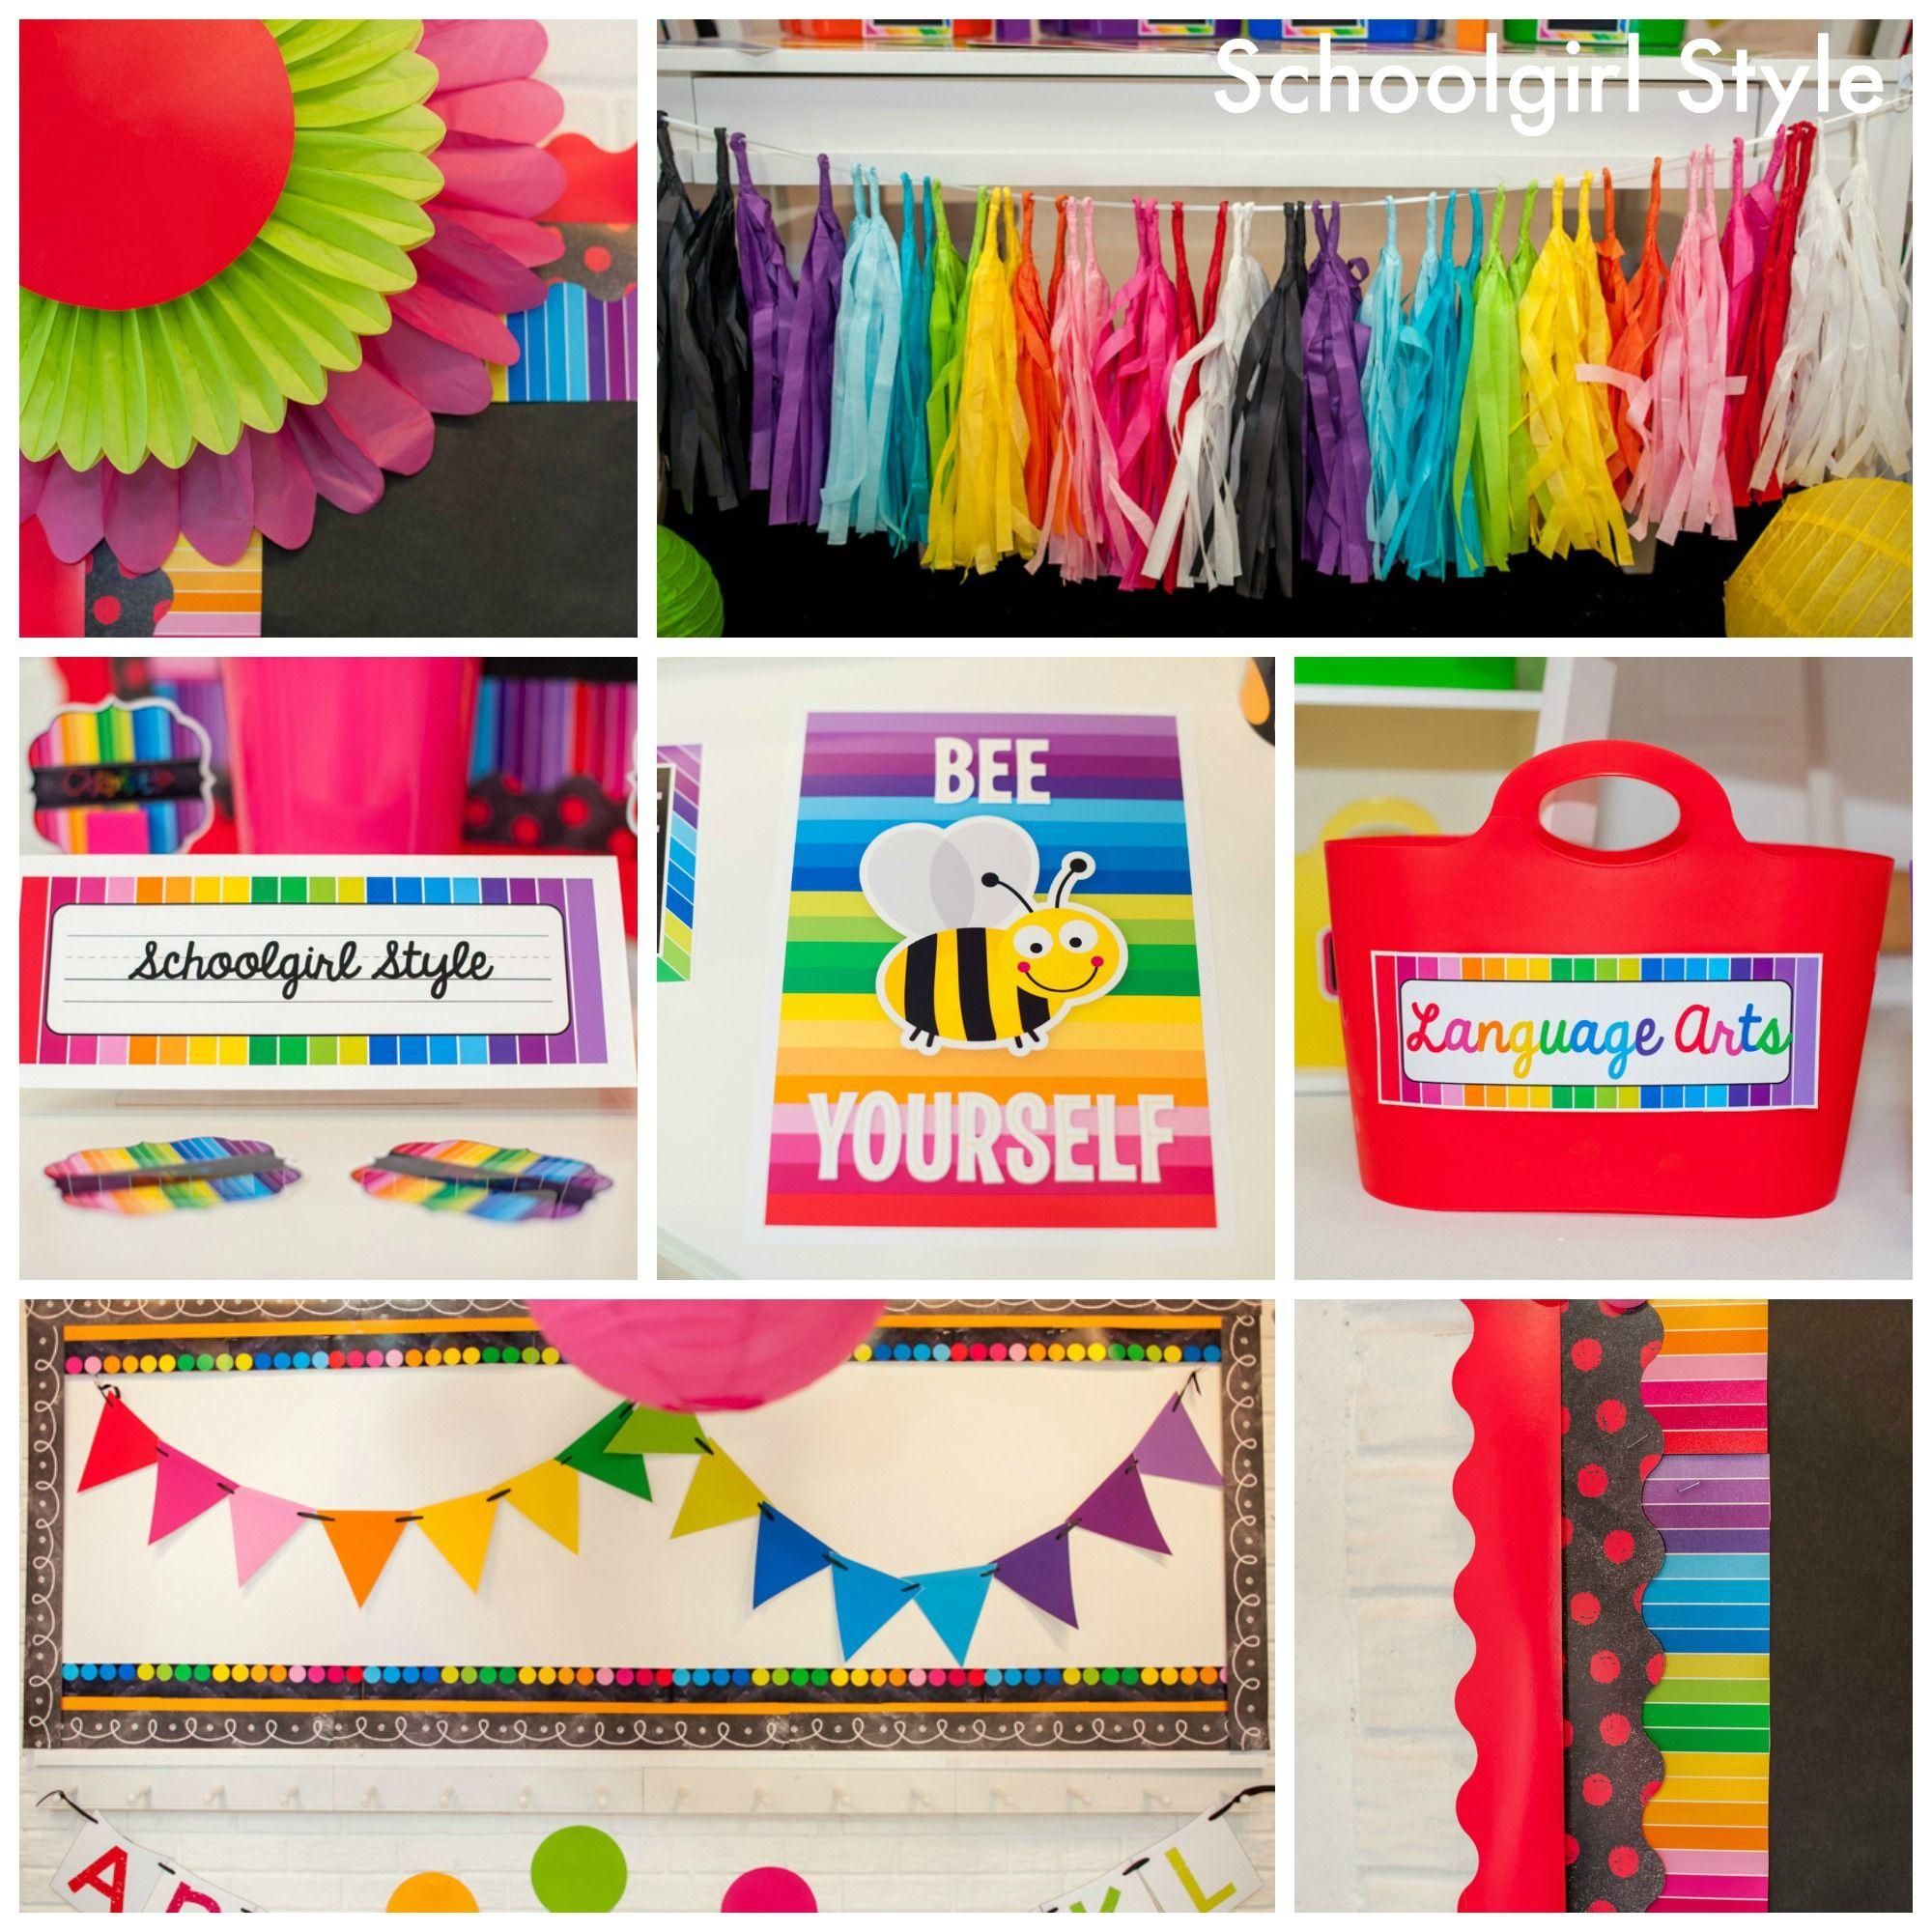 Happy Rainbow Chalkboard By Schoolgirl Style I Love The Colors